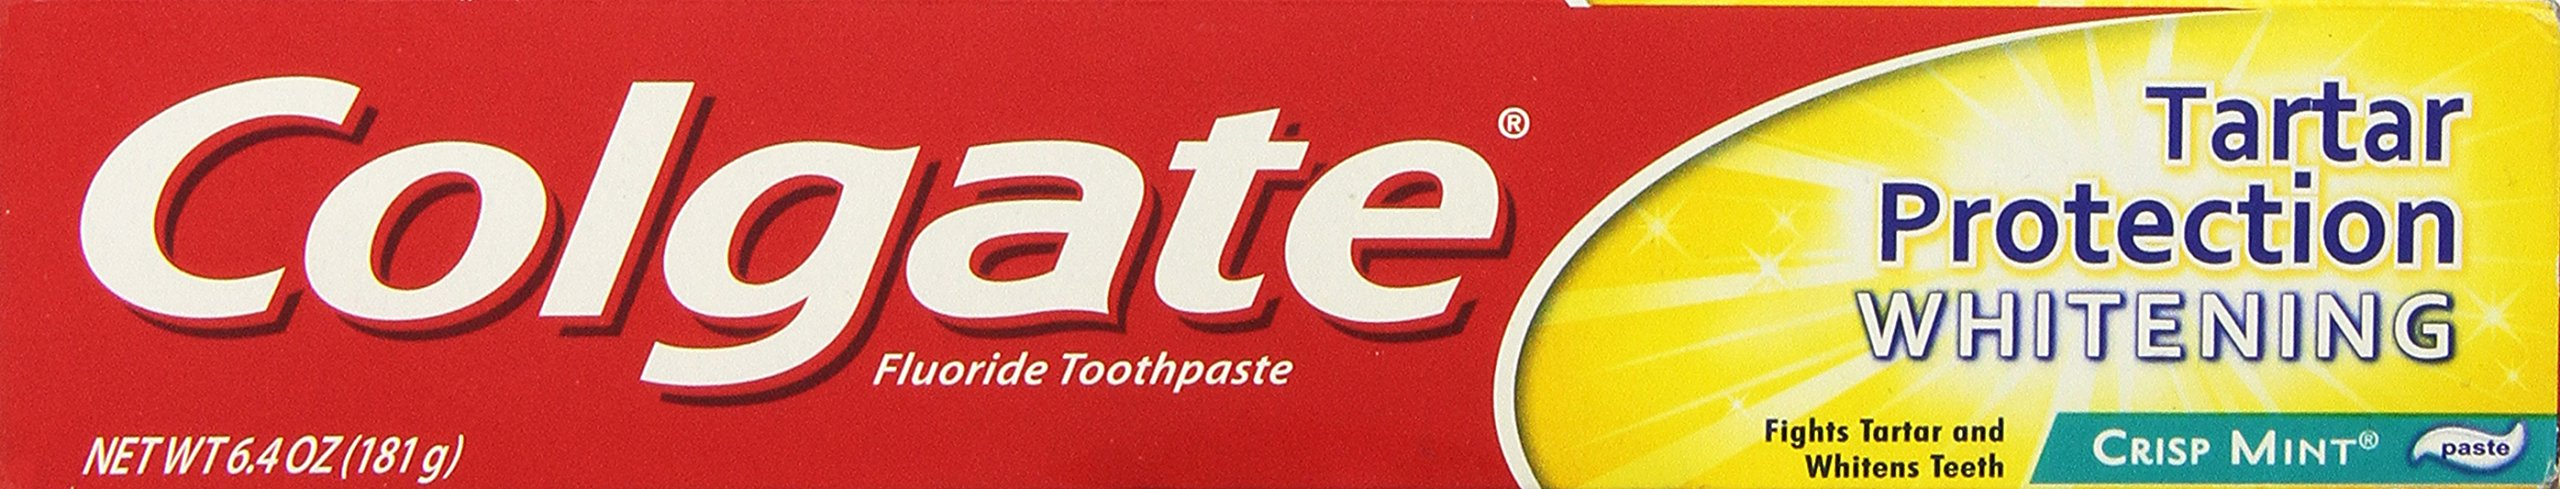 Colgate Tartar Control Whitening Fluoride Toothpaste, Crisp Mint Paste , 6.4 oz (181 g)